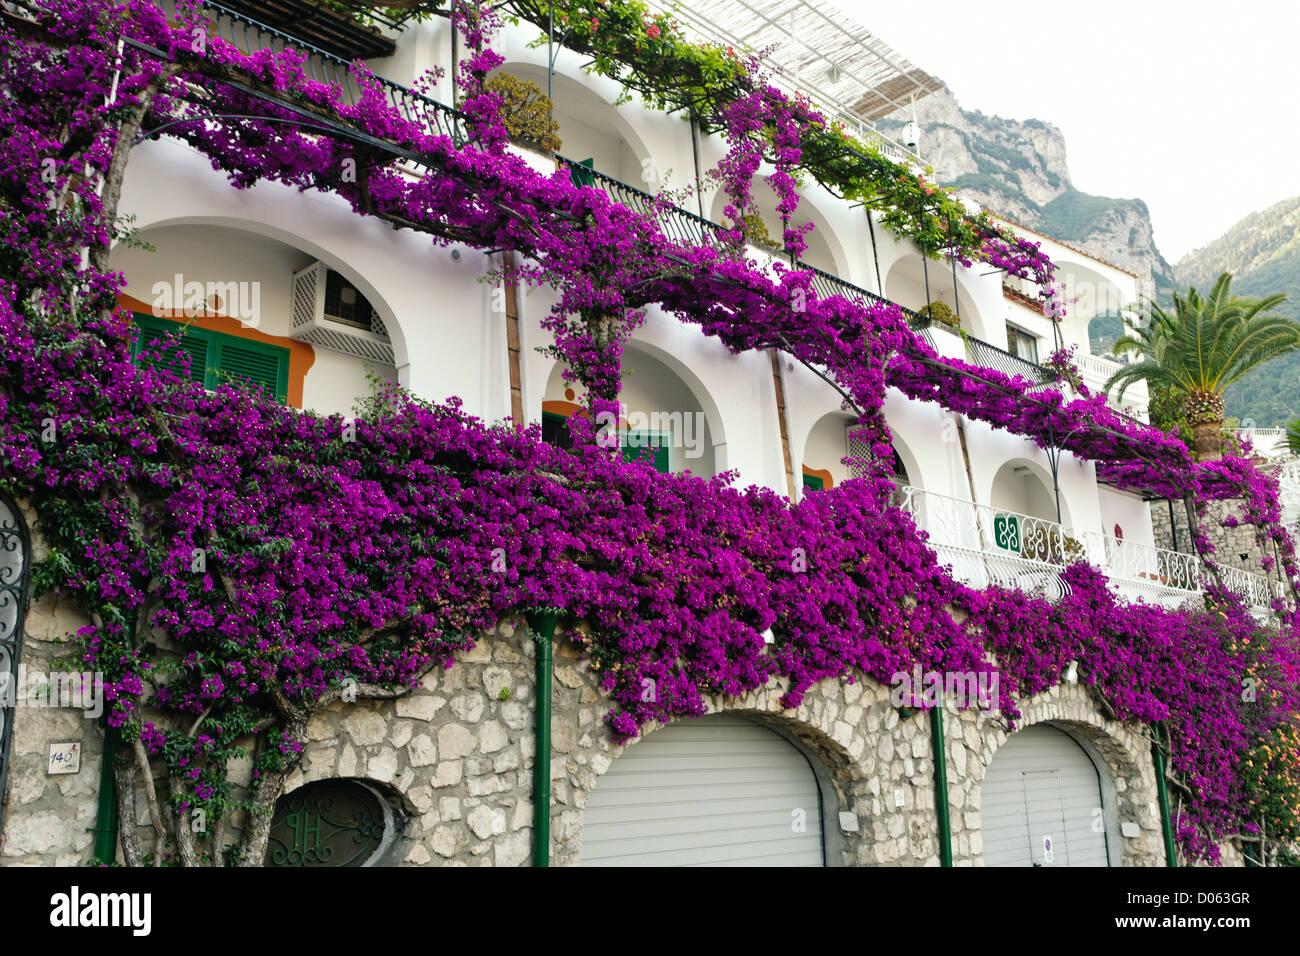 Lila Bluten Bedeckt Hausfassade Hotel Poseidon Positano Kampanien